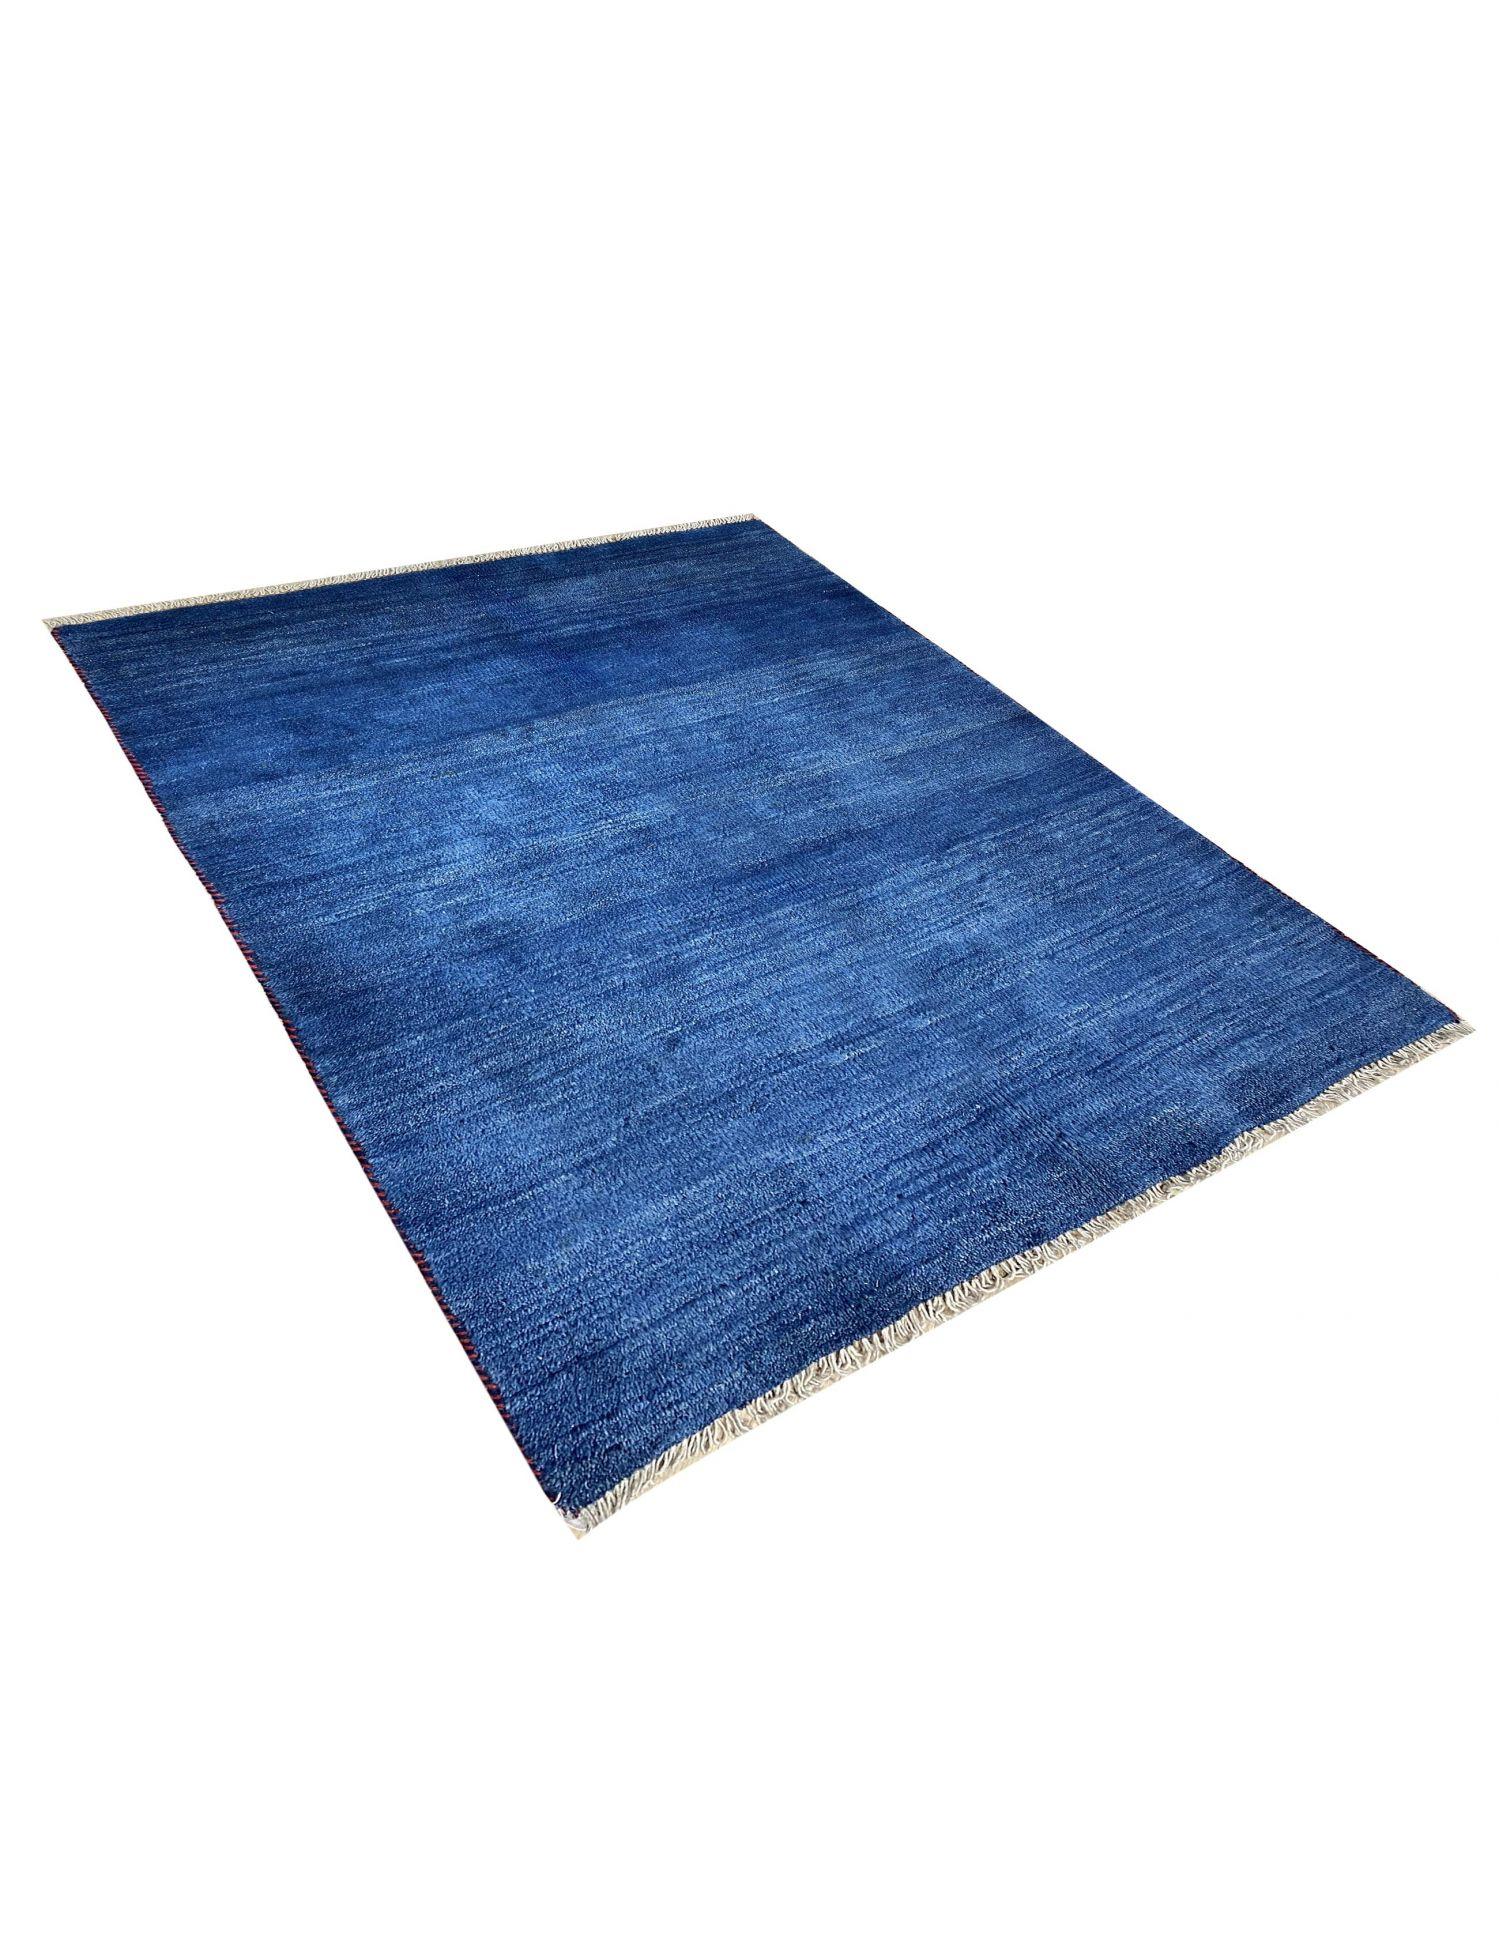 Moderne Teppiche  blau <br/>163 x 110 cm